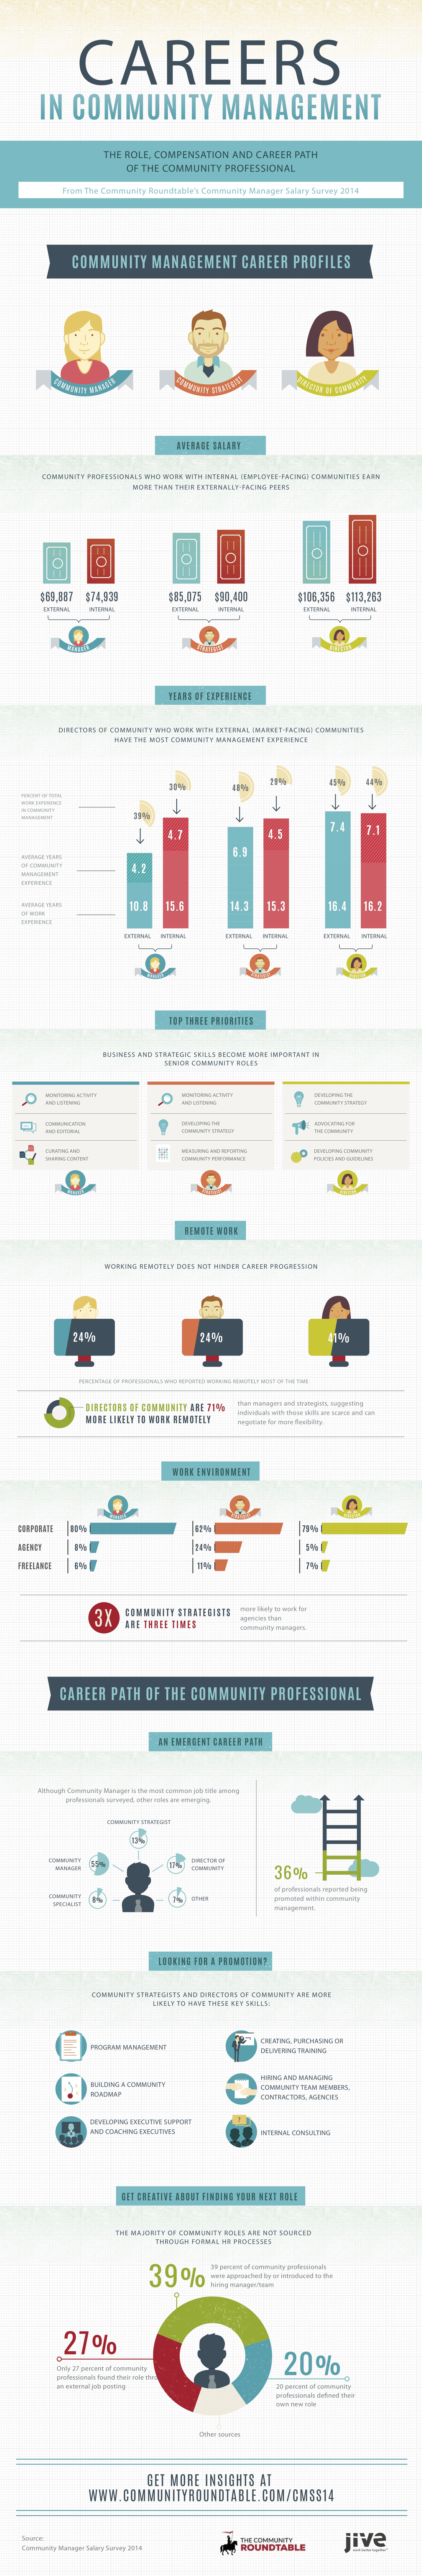 Careers In Community Management